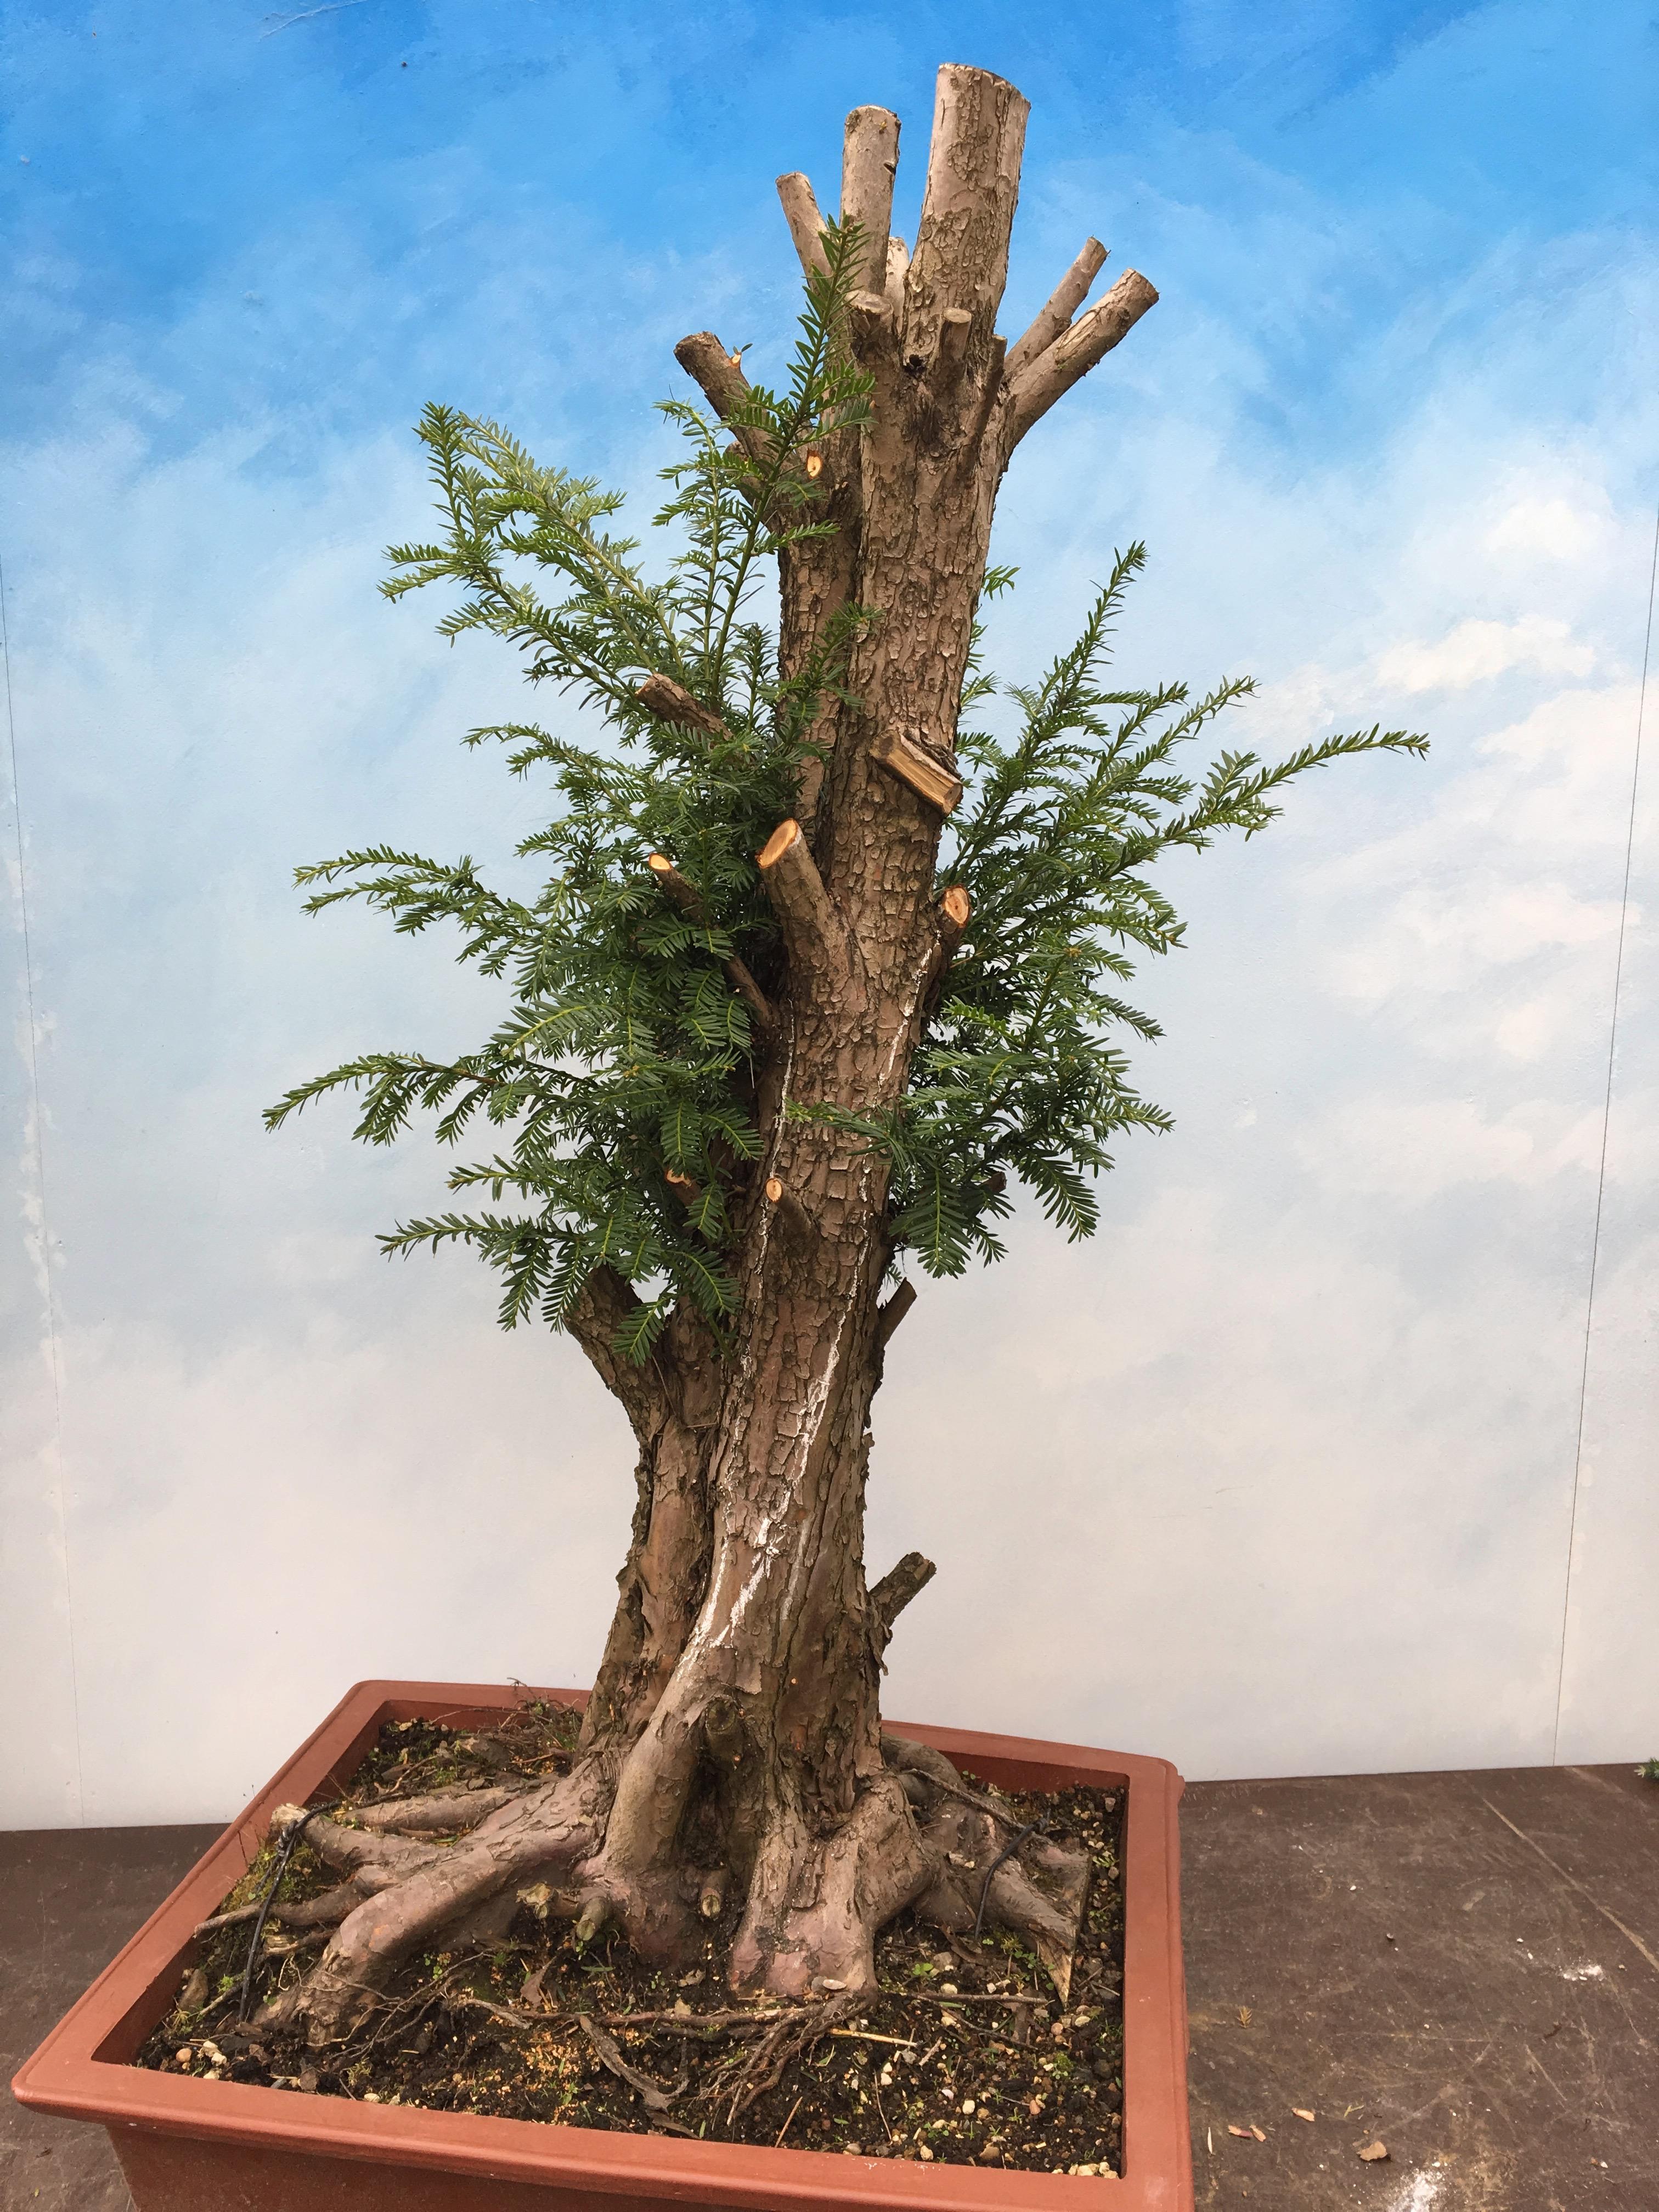 January 2017 John Hanby Bonsai Wiring Yew One Thing Is For Certainnobody Will Just Walk Straight Past This Tree Again